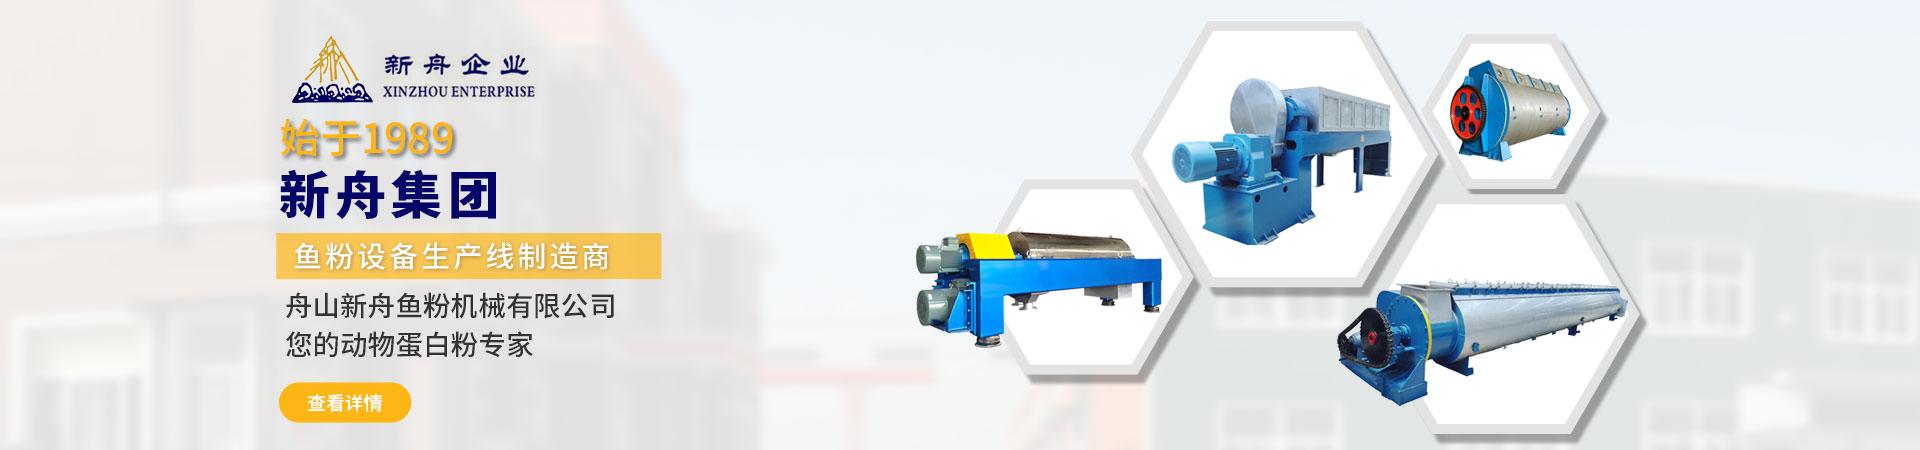 RAYBET官网下载集团雷电竞官网入口设备raybetAPP制造商